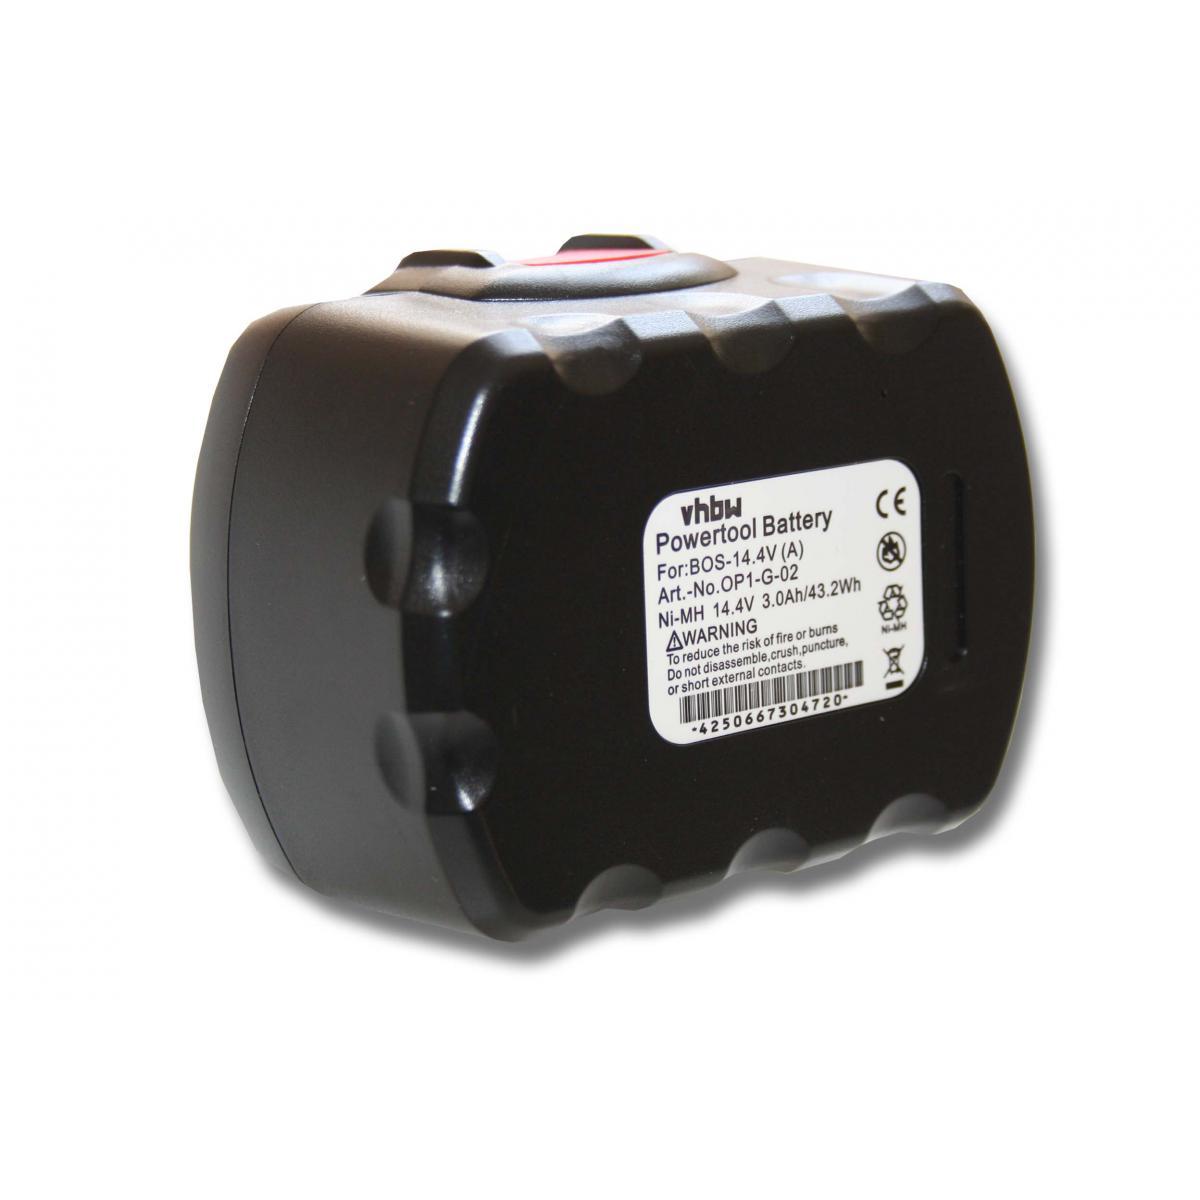 Vhbw vhbw Batterie compatible avec Bosch PKS 14.4V, PSB 14, PSB 14.4V, PSR 14.4, PSR 14.4-2, PSR 14.4/N outil électrique (300